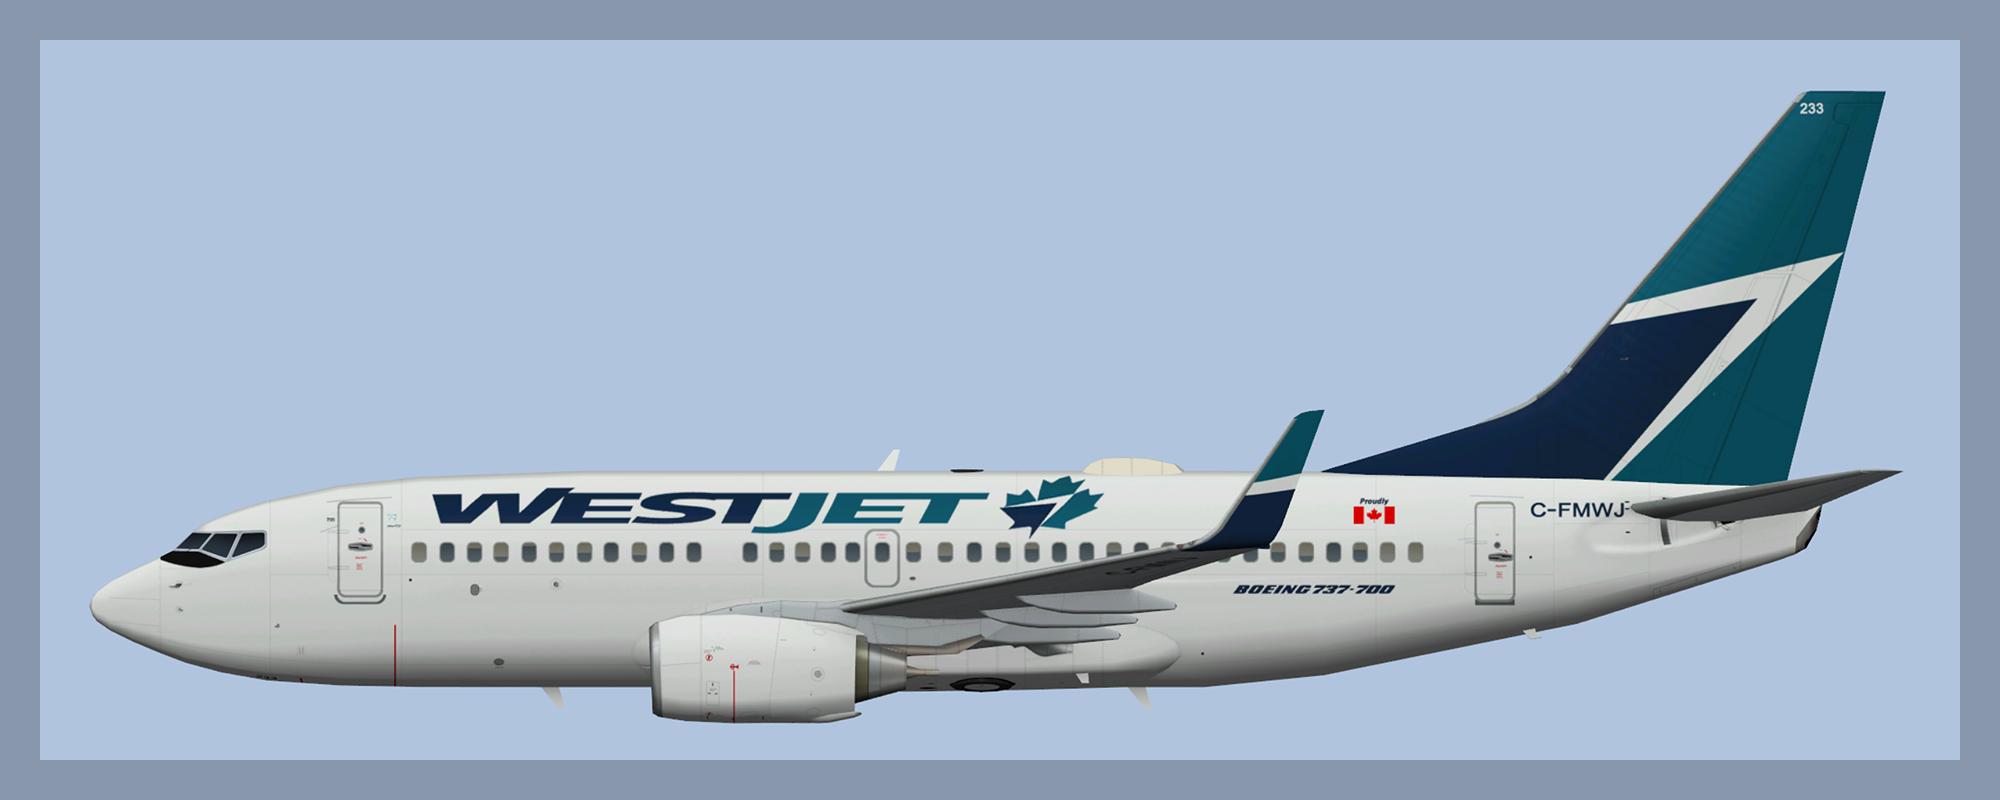 Westjet Boeing 737-700  sc 1 st  ATCO Repaints & Westjet Boeing 737-700 \u2013 ATCO Repaints